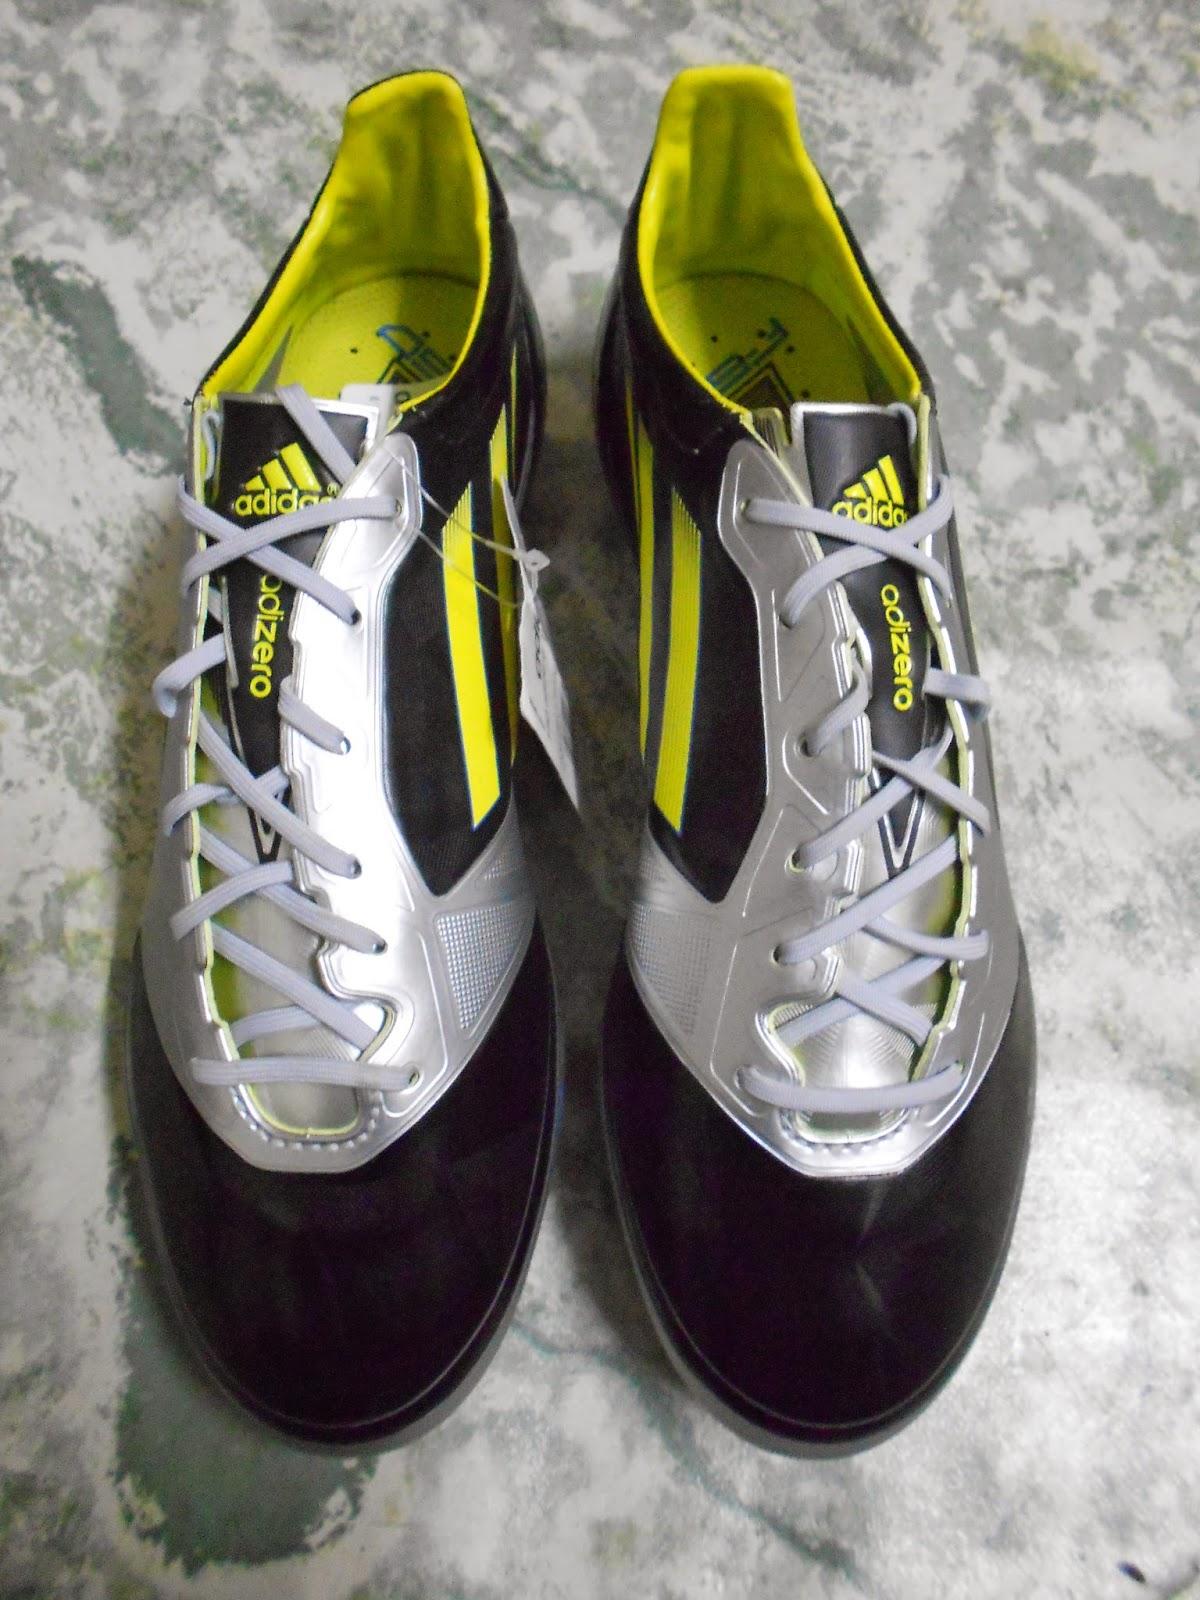 http://kasutbolacun.blogspot.com/2014/05/adidas-f50-adizero-micoach-1-fg-hitam_7944.html